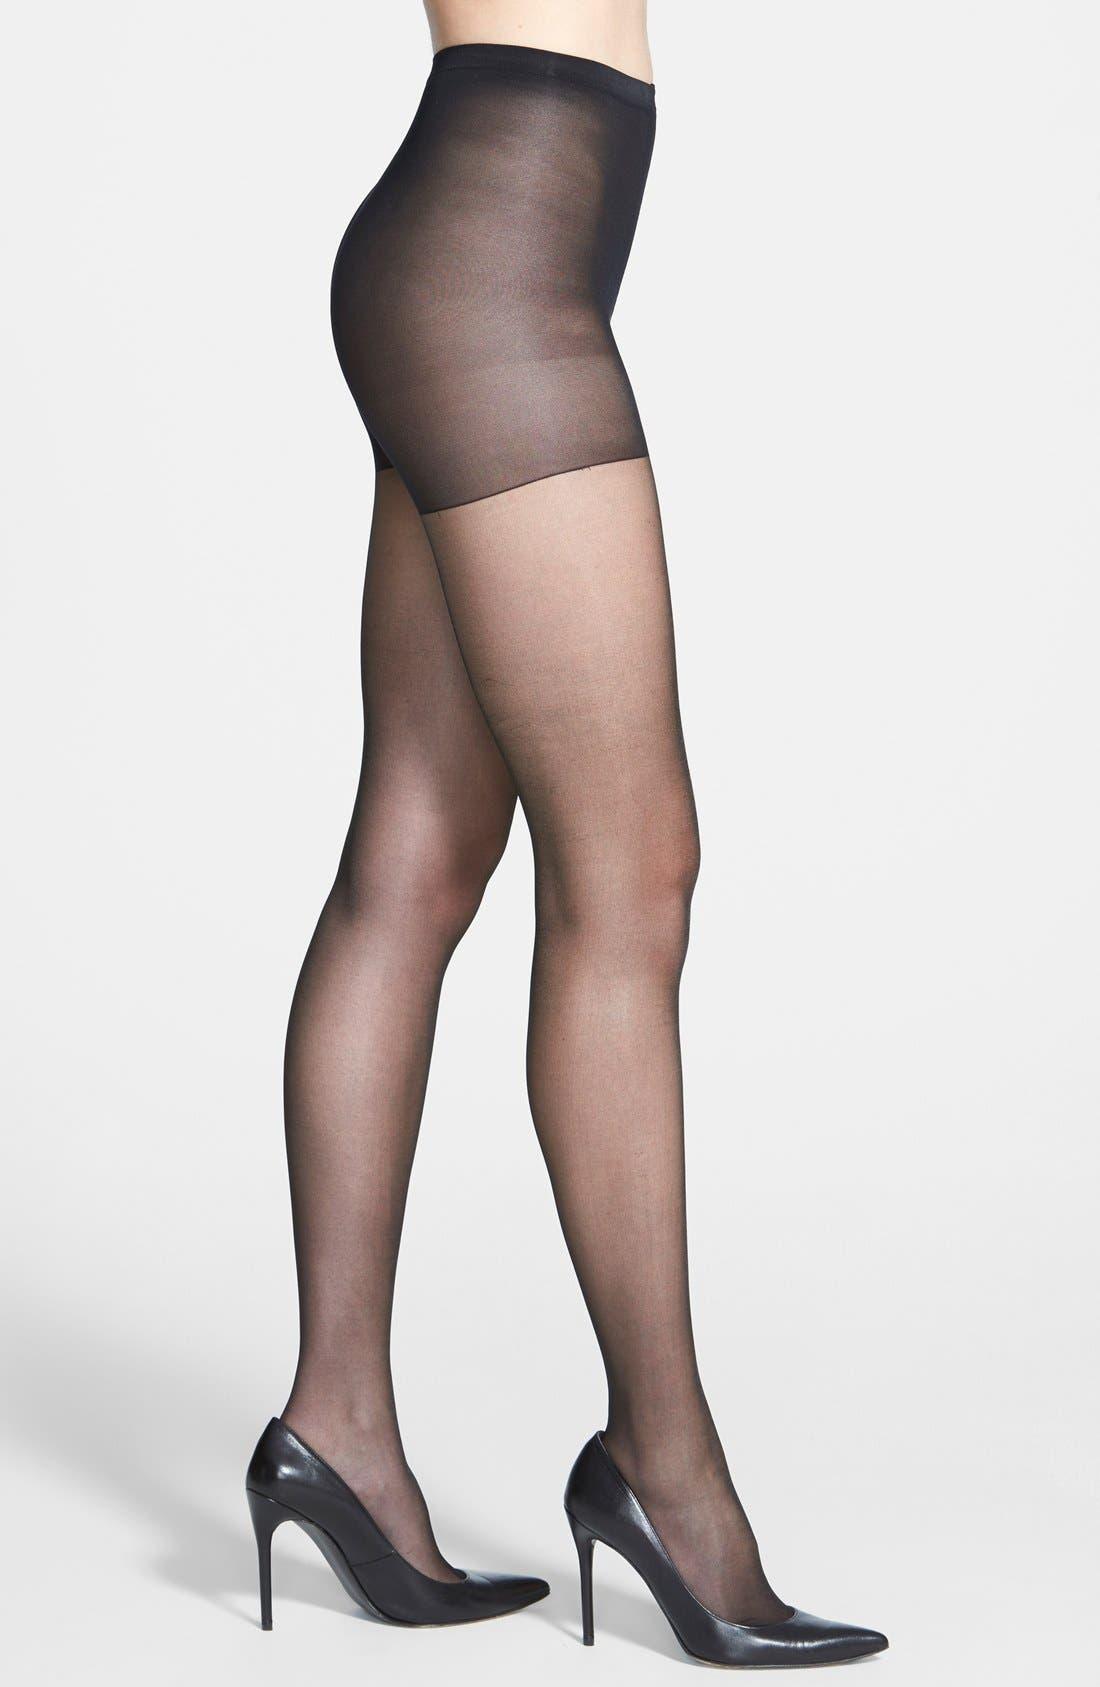 Shimmer Sheer Control Top Pantyhose,                         Main,                         color, Black